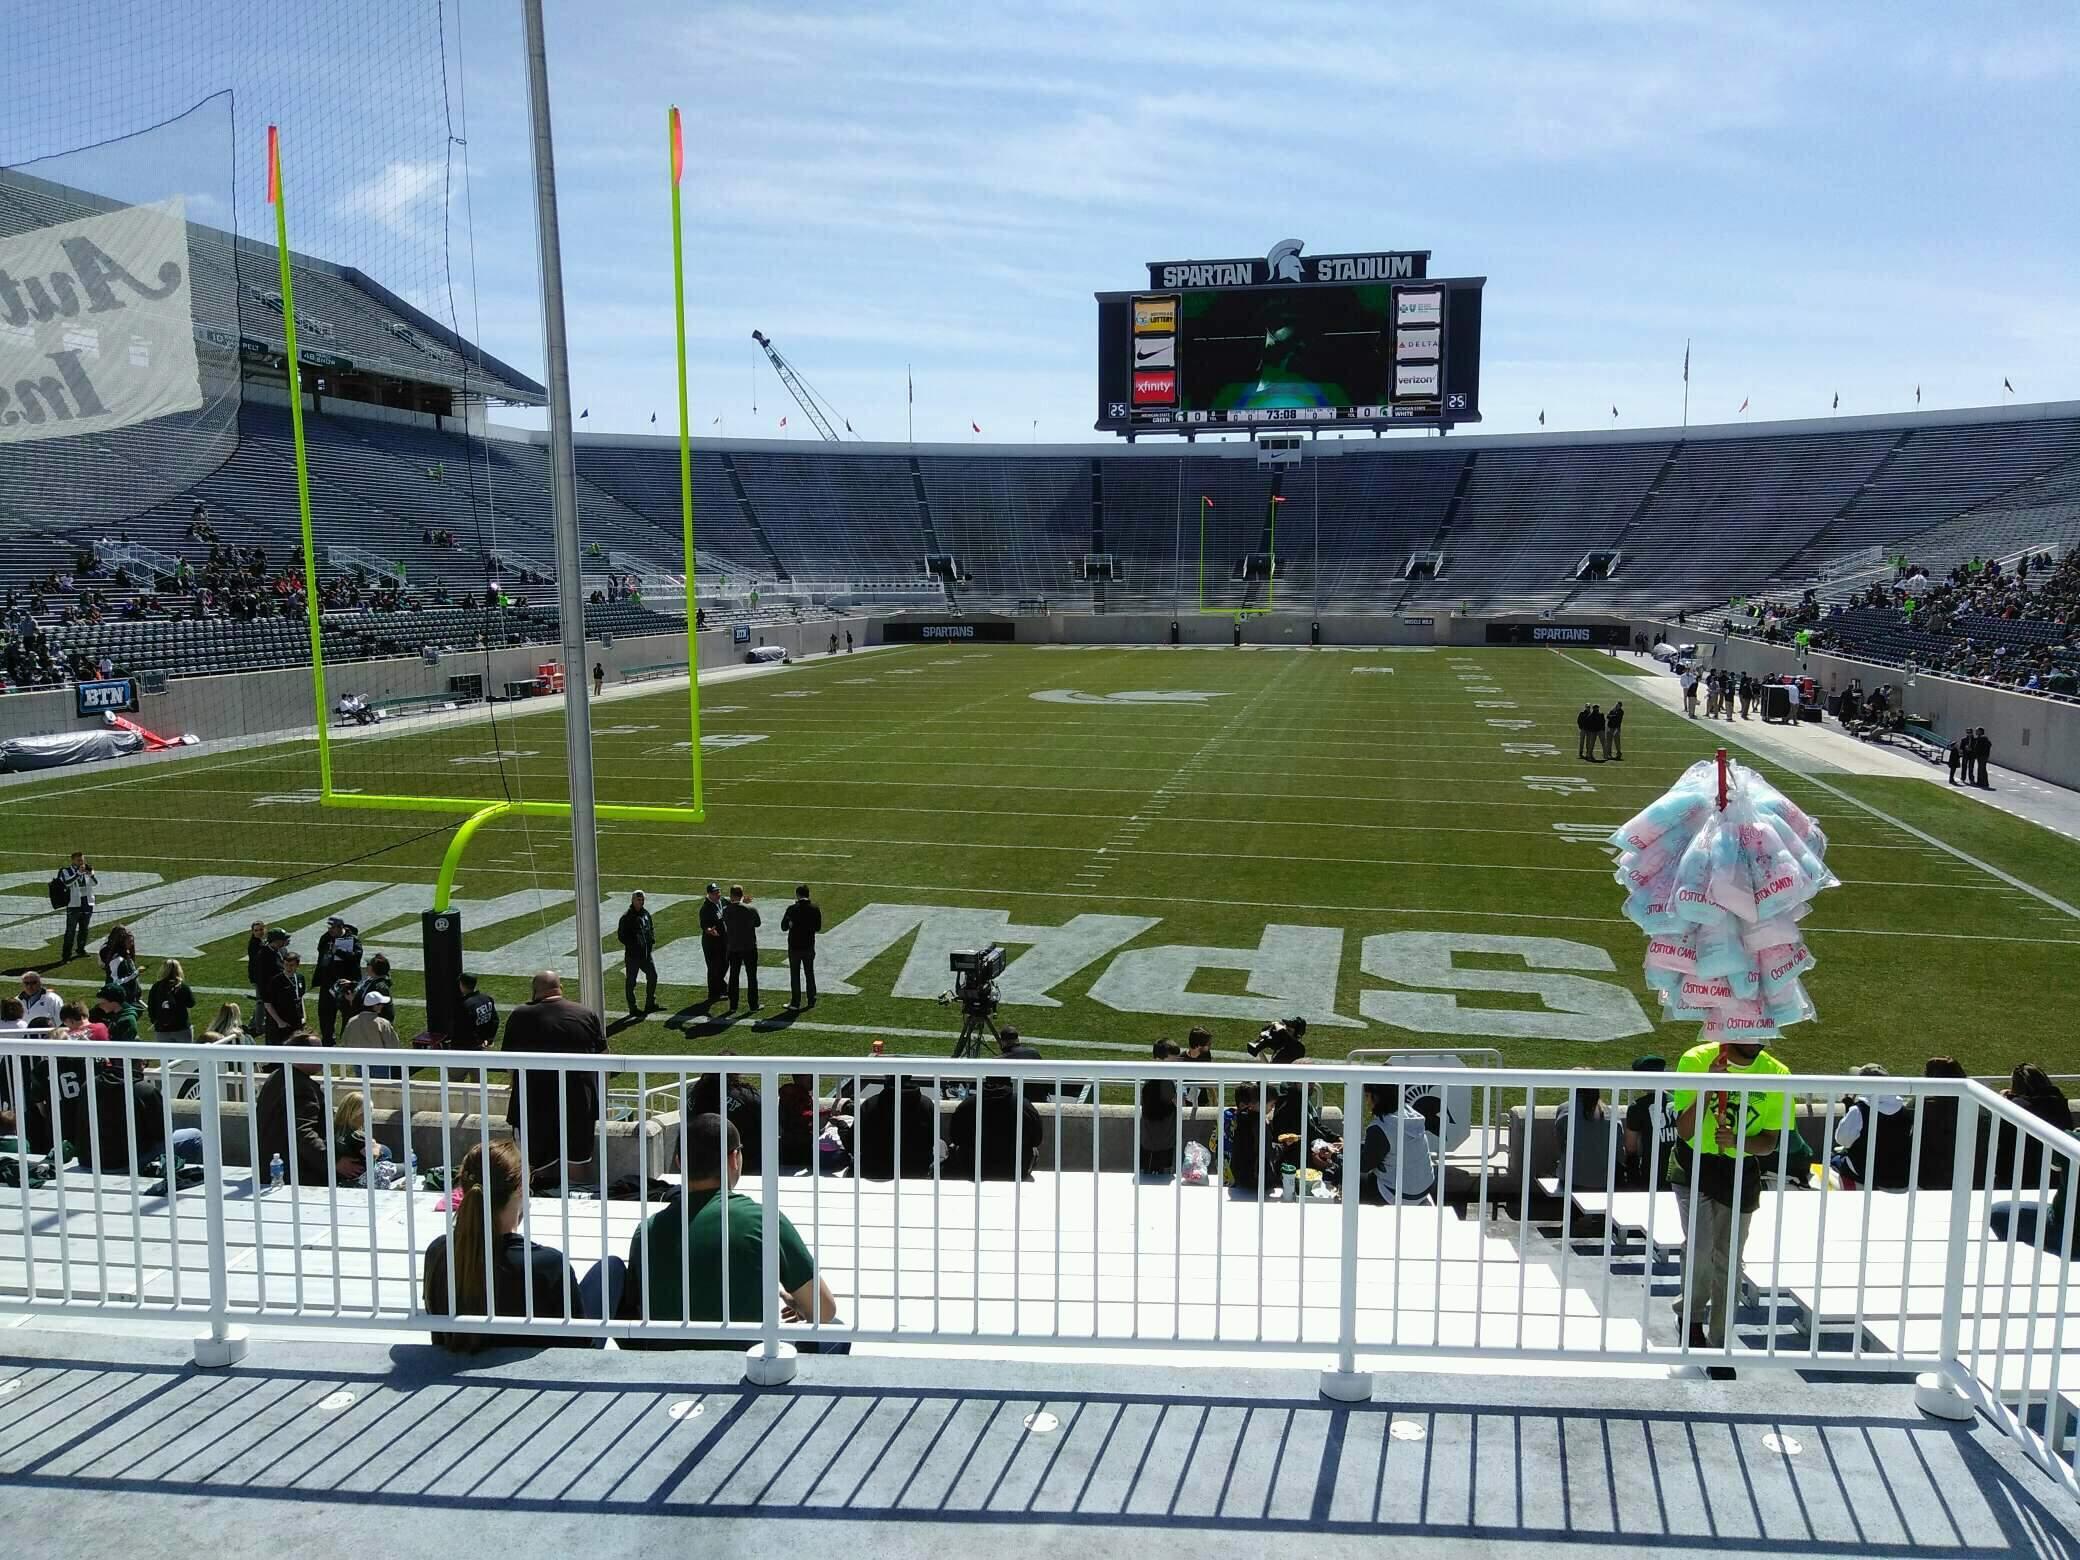 Spartan Stadium Section 30 Row 19 Seat 42